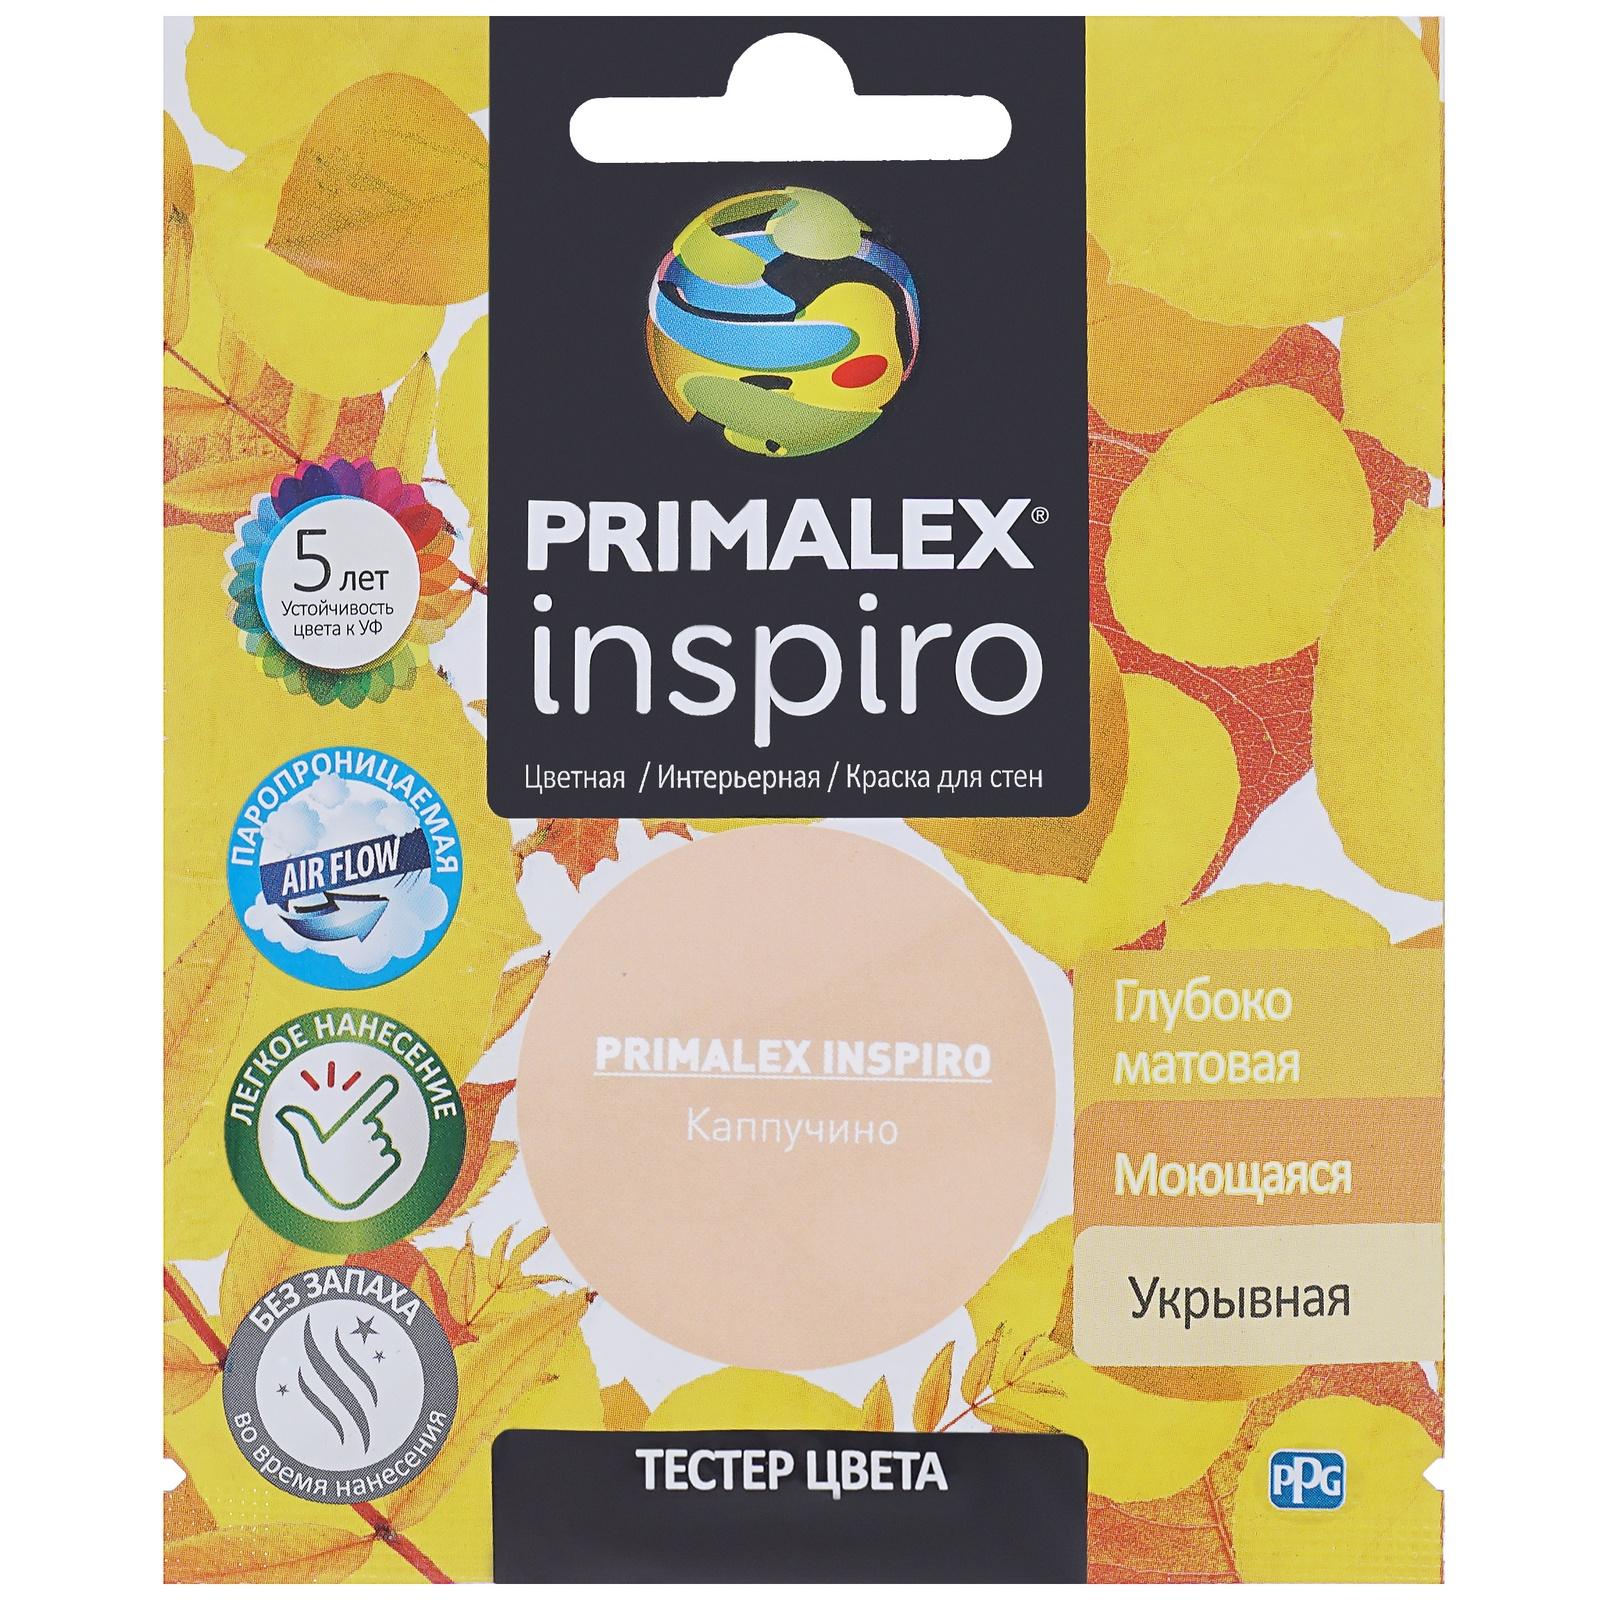 Краска Primalex Inspiro Каппучино 40мл краска ppg primalex inspiro красный мак 40мл pmx i47